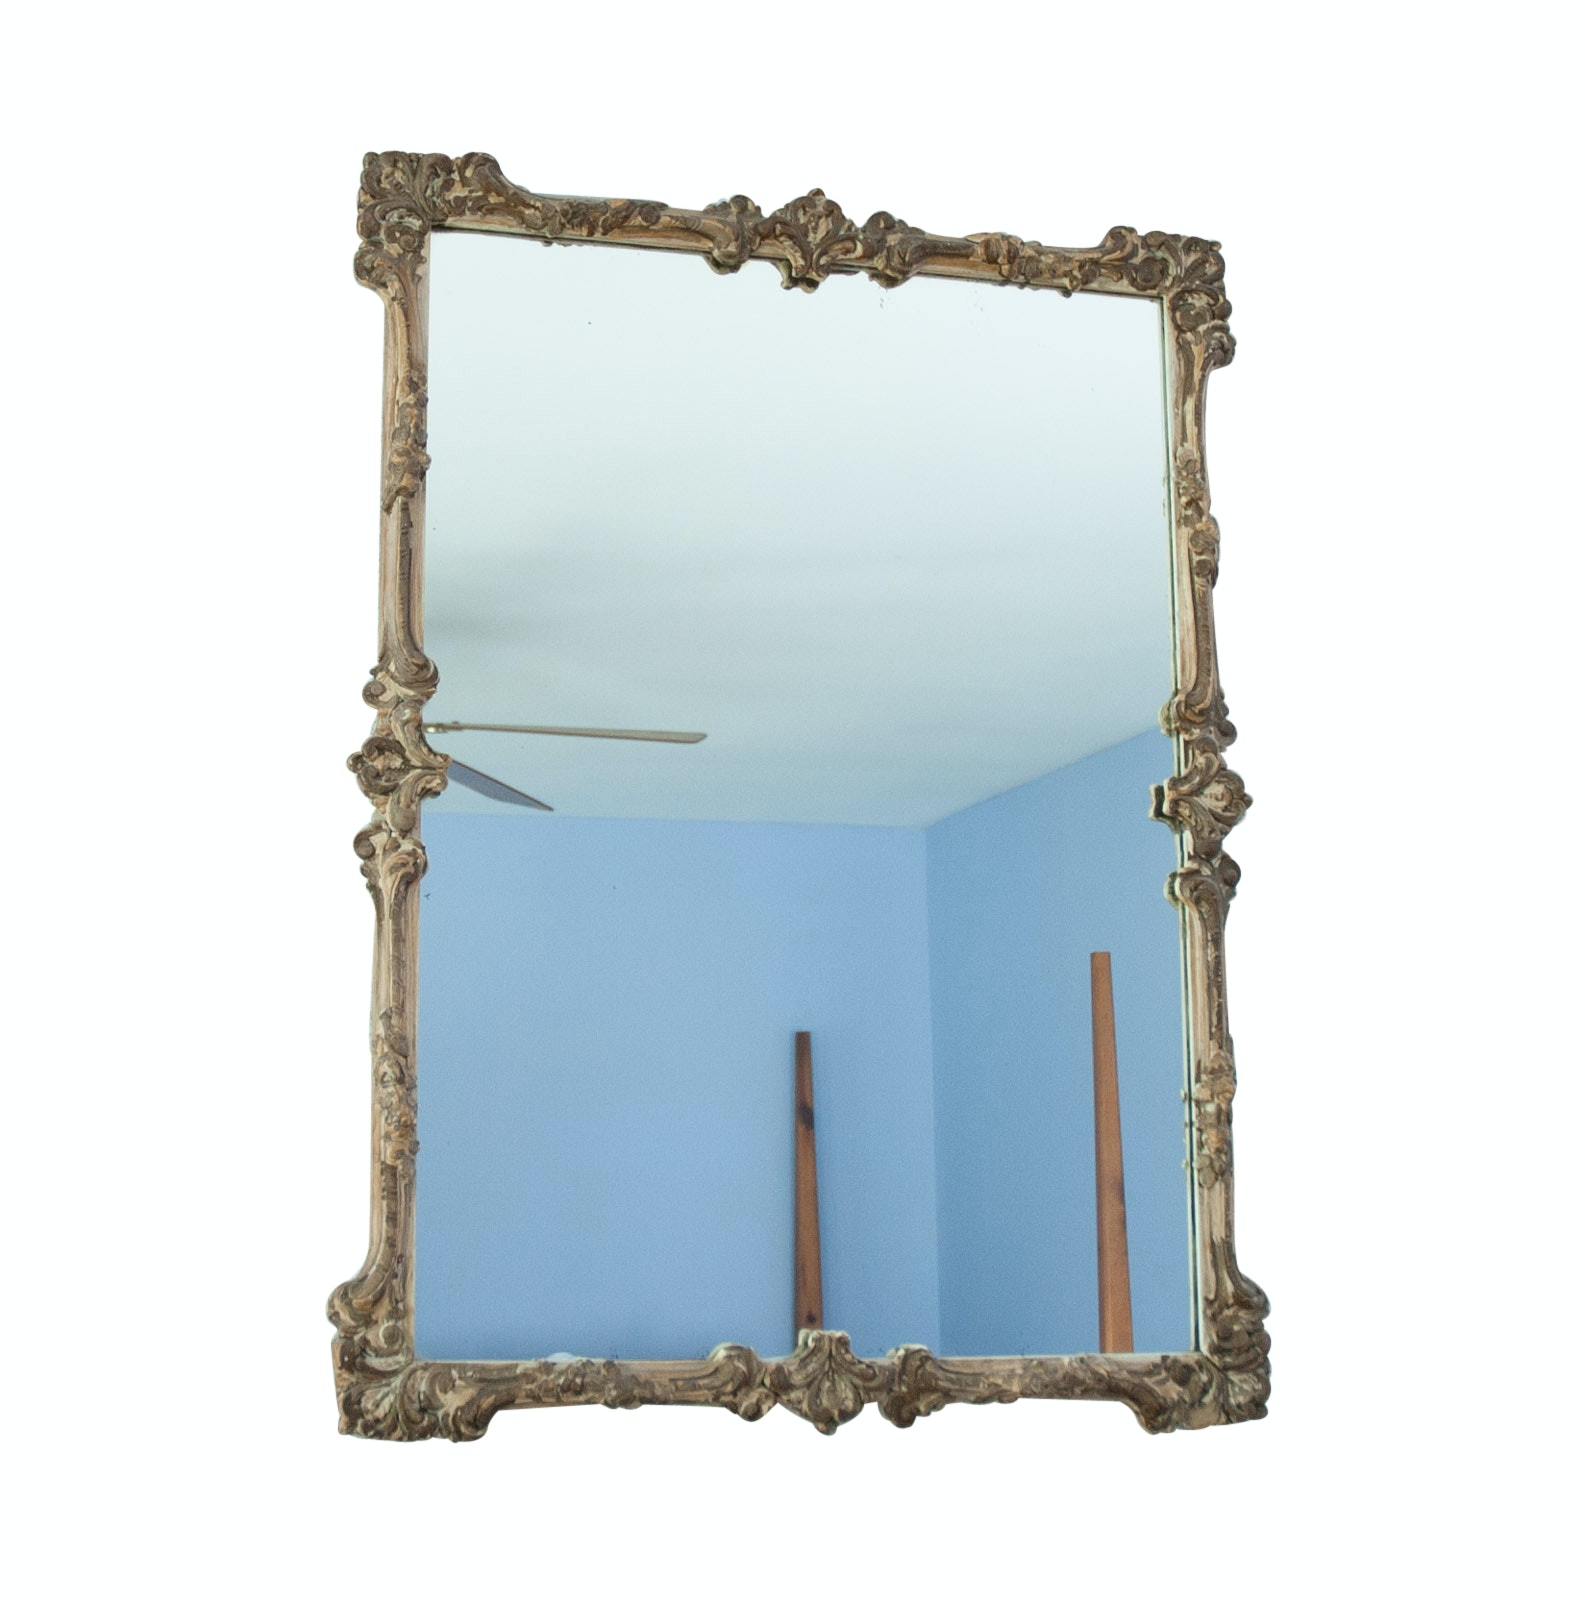 Vintage Giltwood Wall Mirror